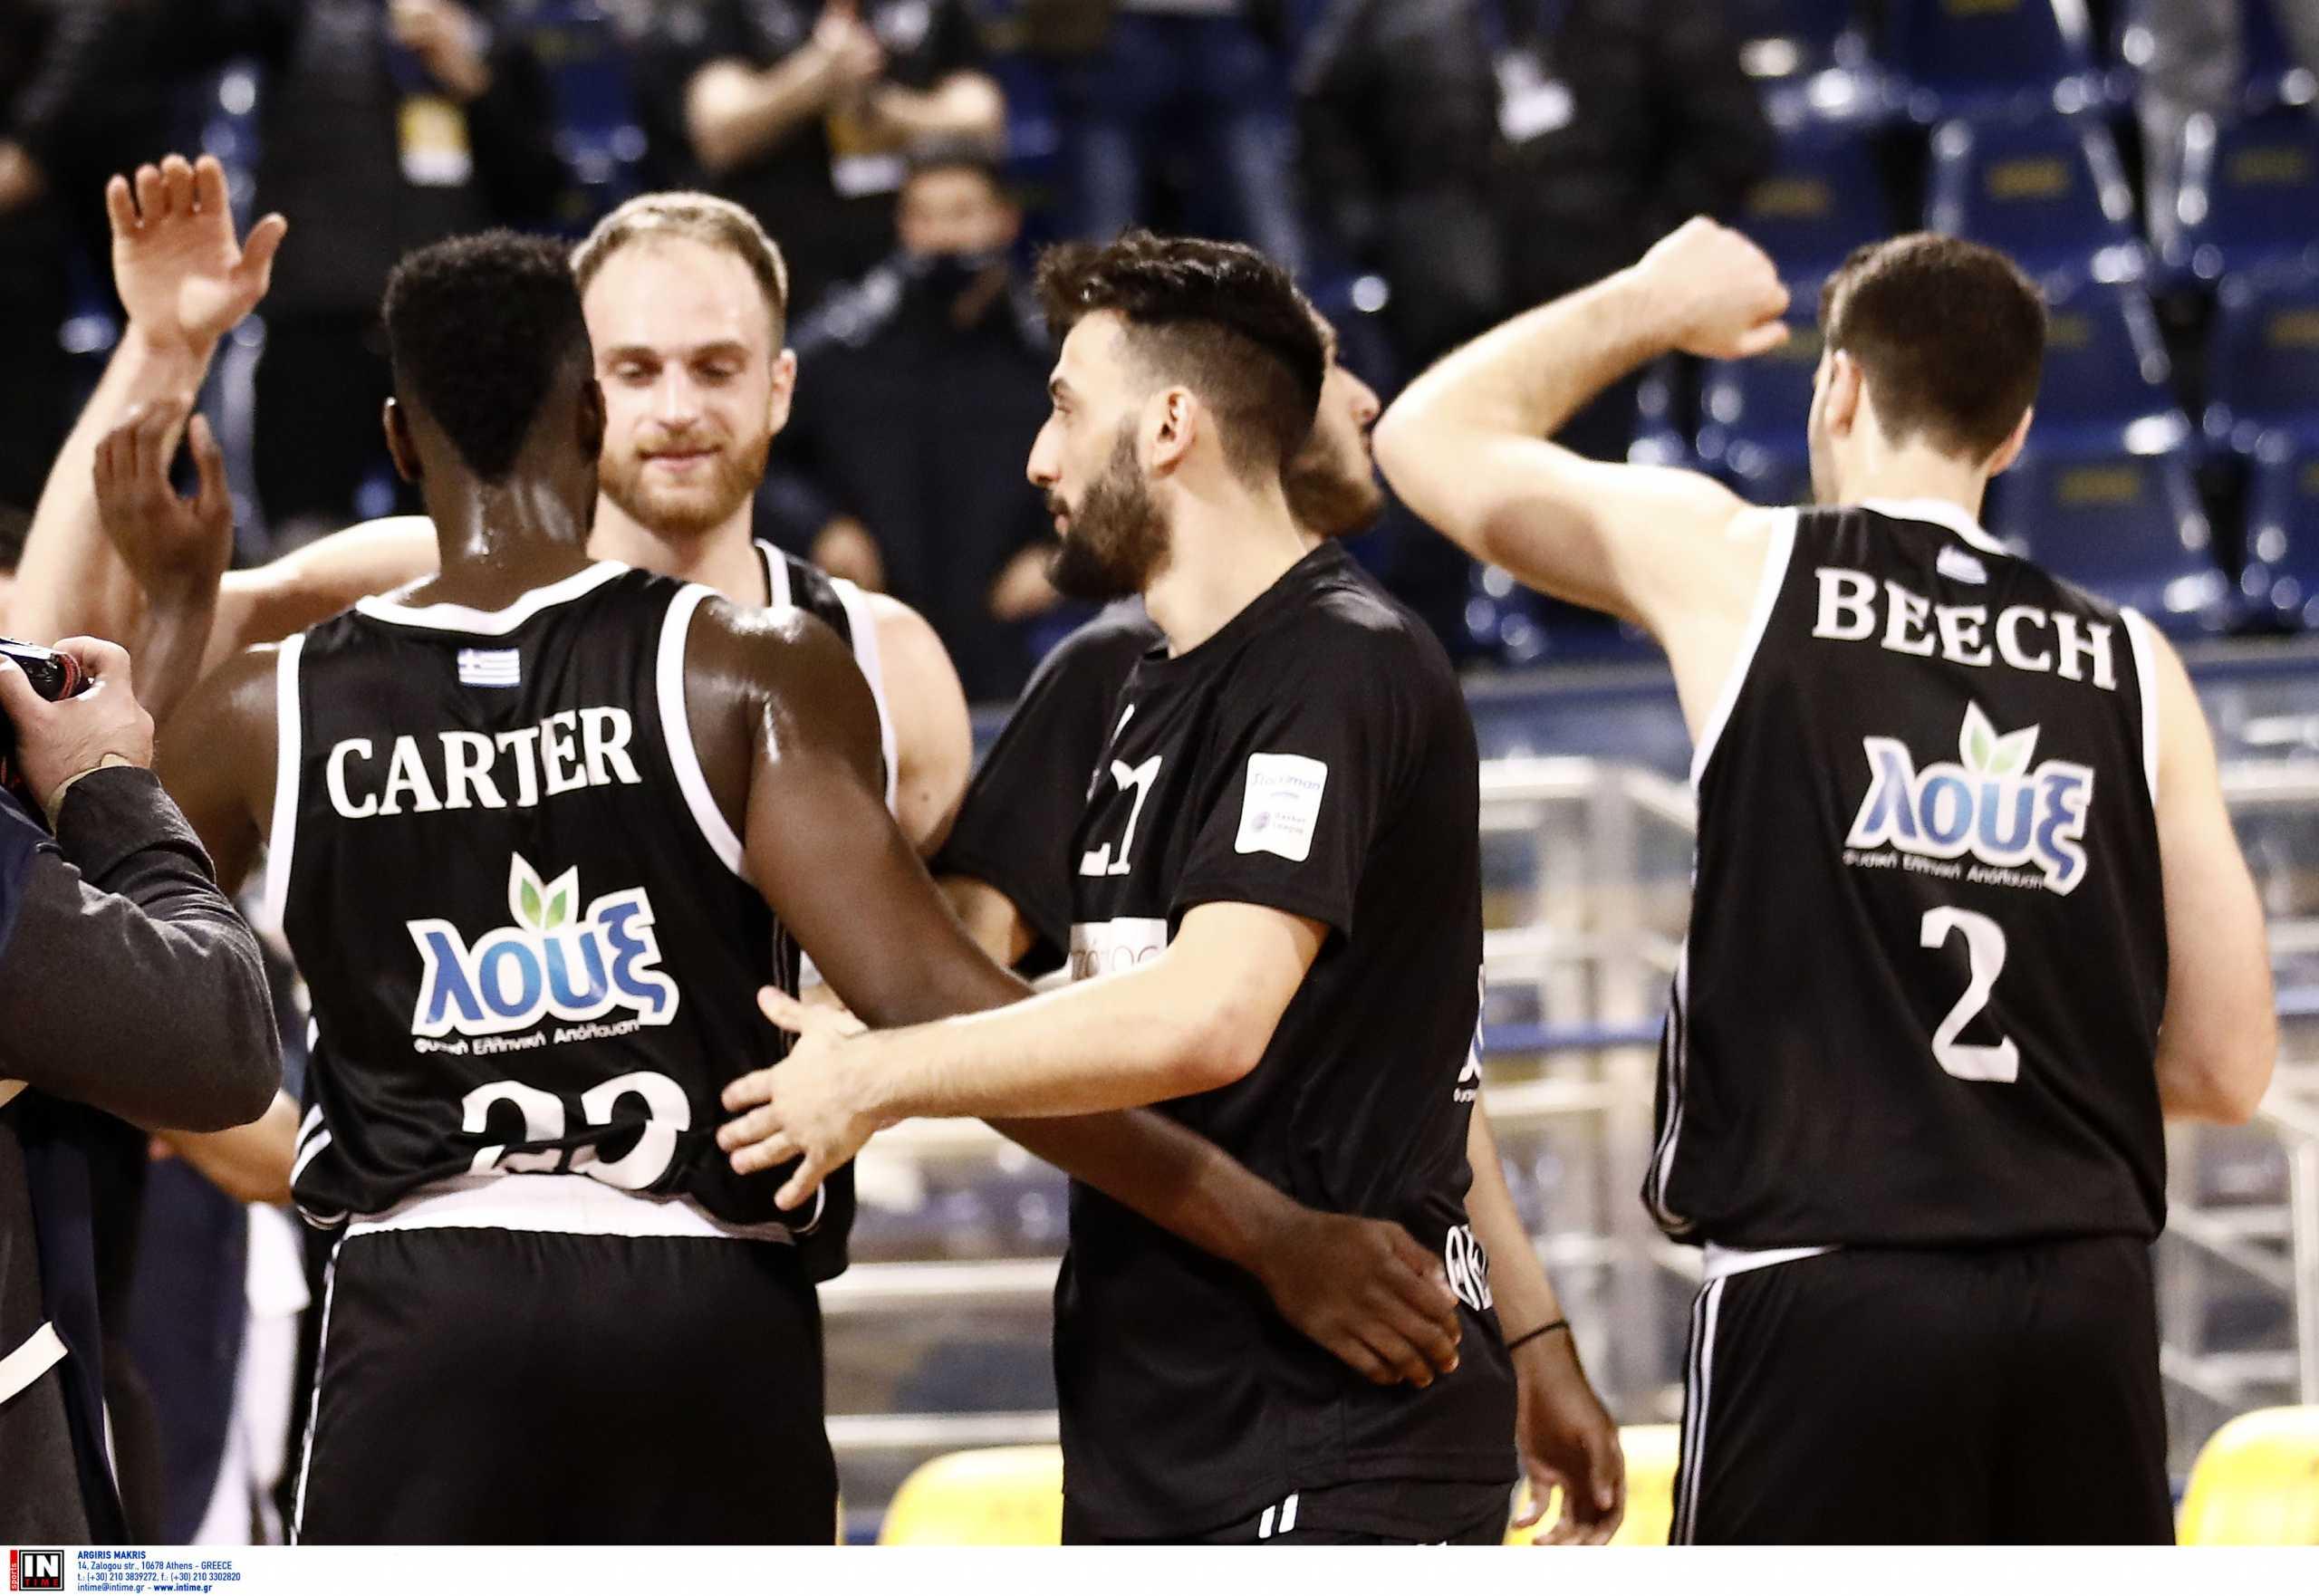 Basket League: Σούπερ ανατροπή από τον ΠΑΟΚ στο ντέρμπι με τον Άρη (video)